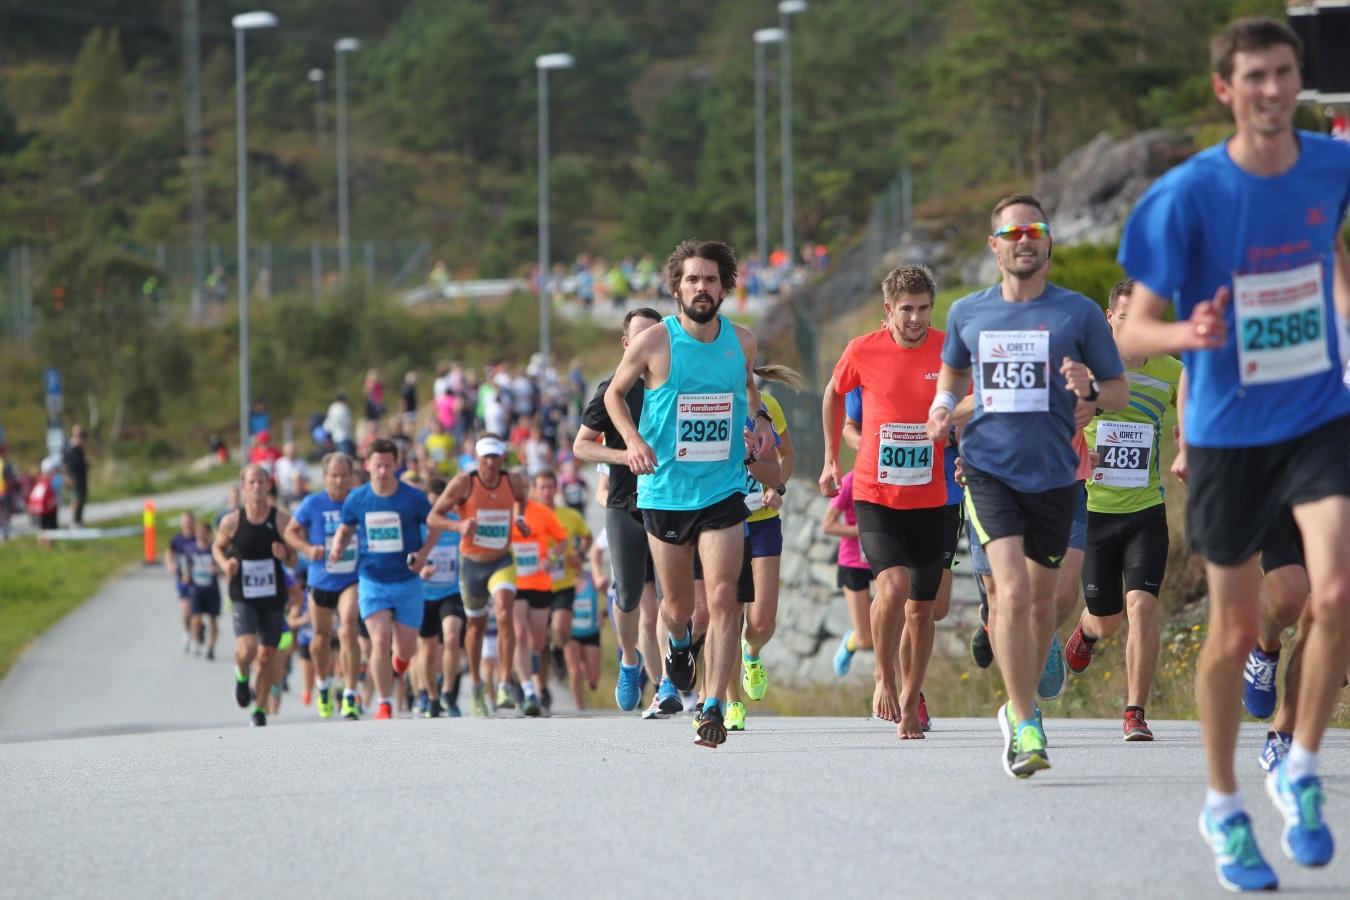 10k the classic race at Knarvikmila